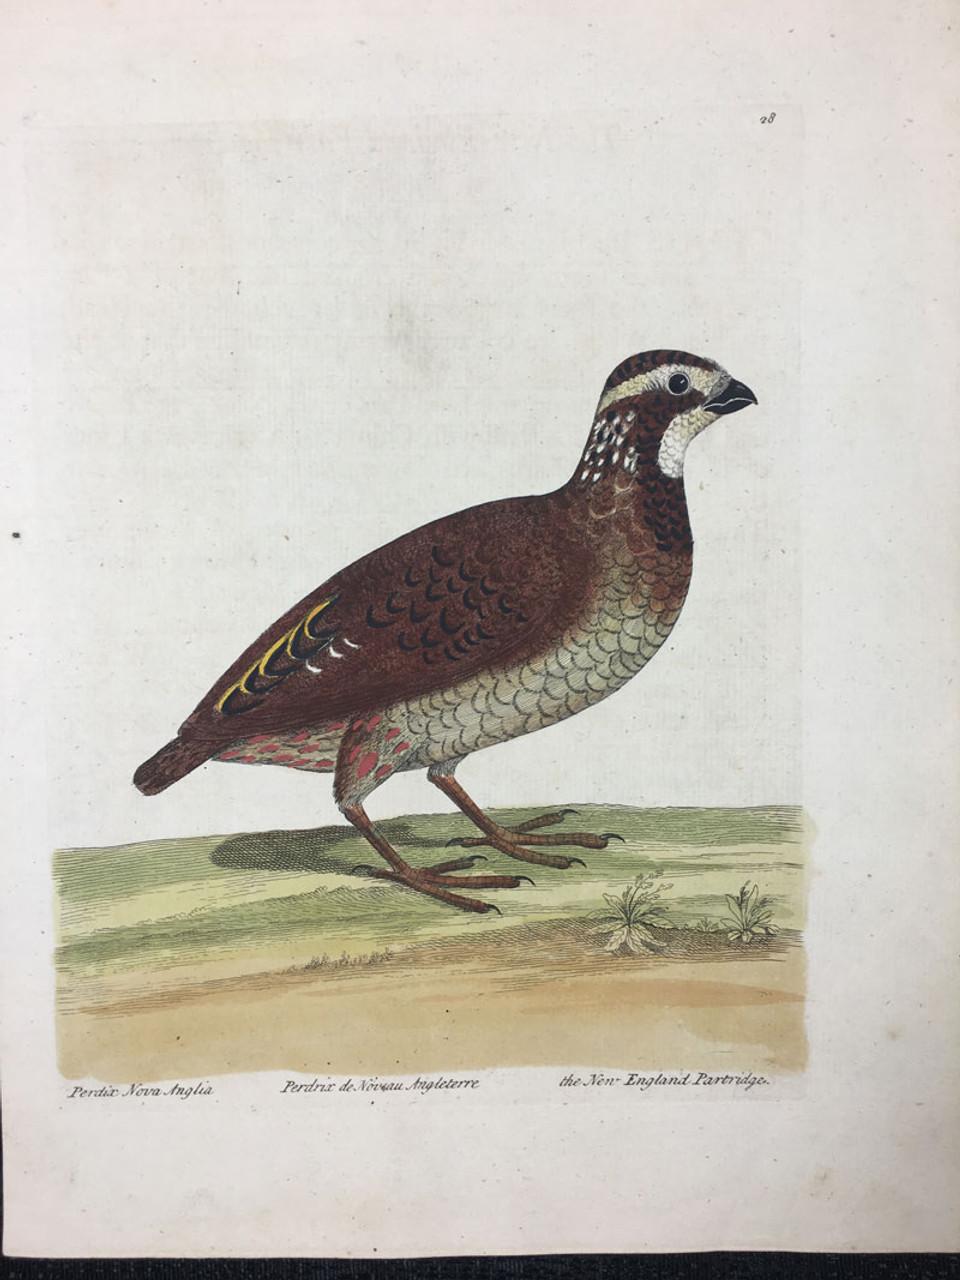 New England Partridge